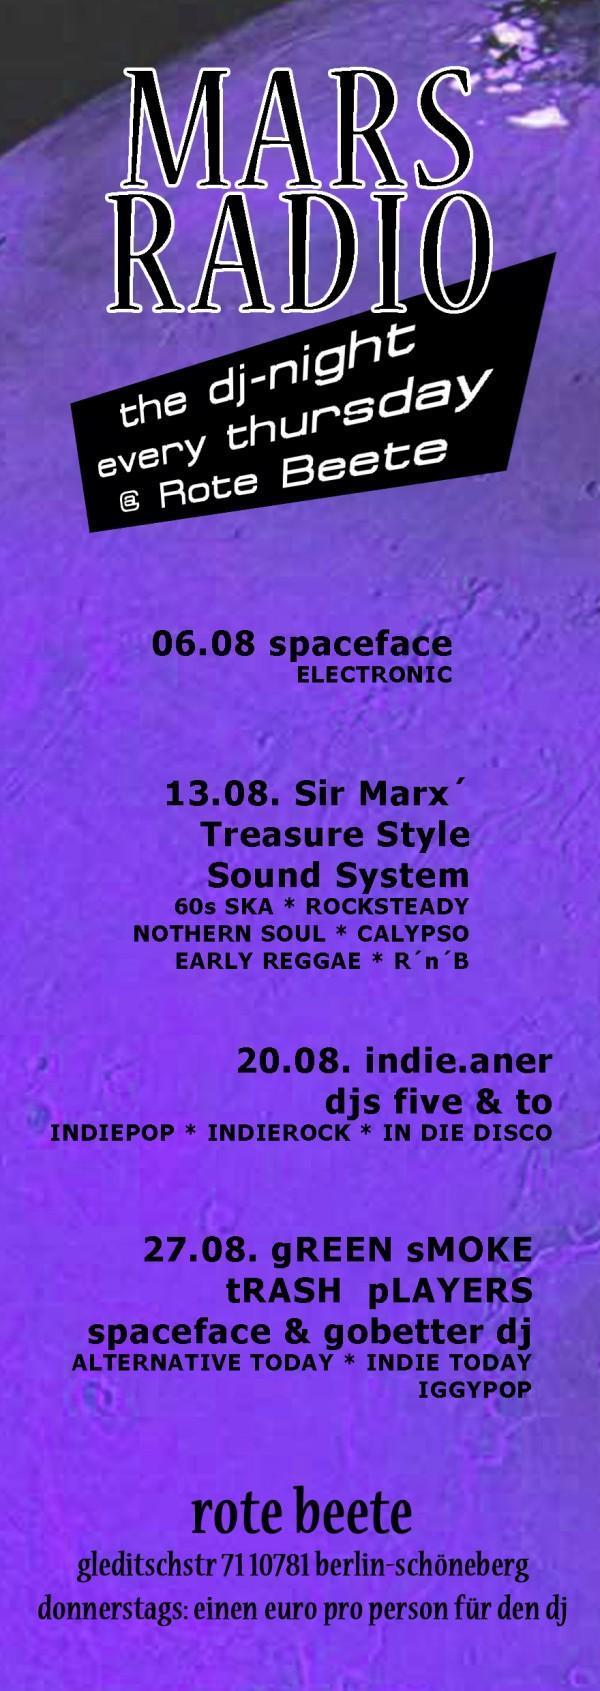 Mars Radio Monatsübersicht 08.2009 designed by Designjockey